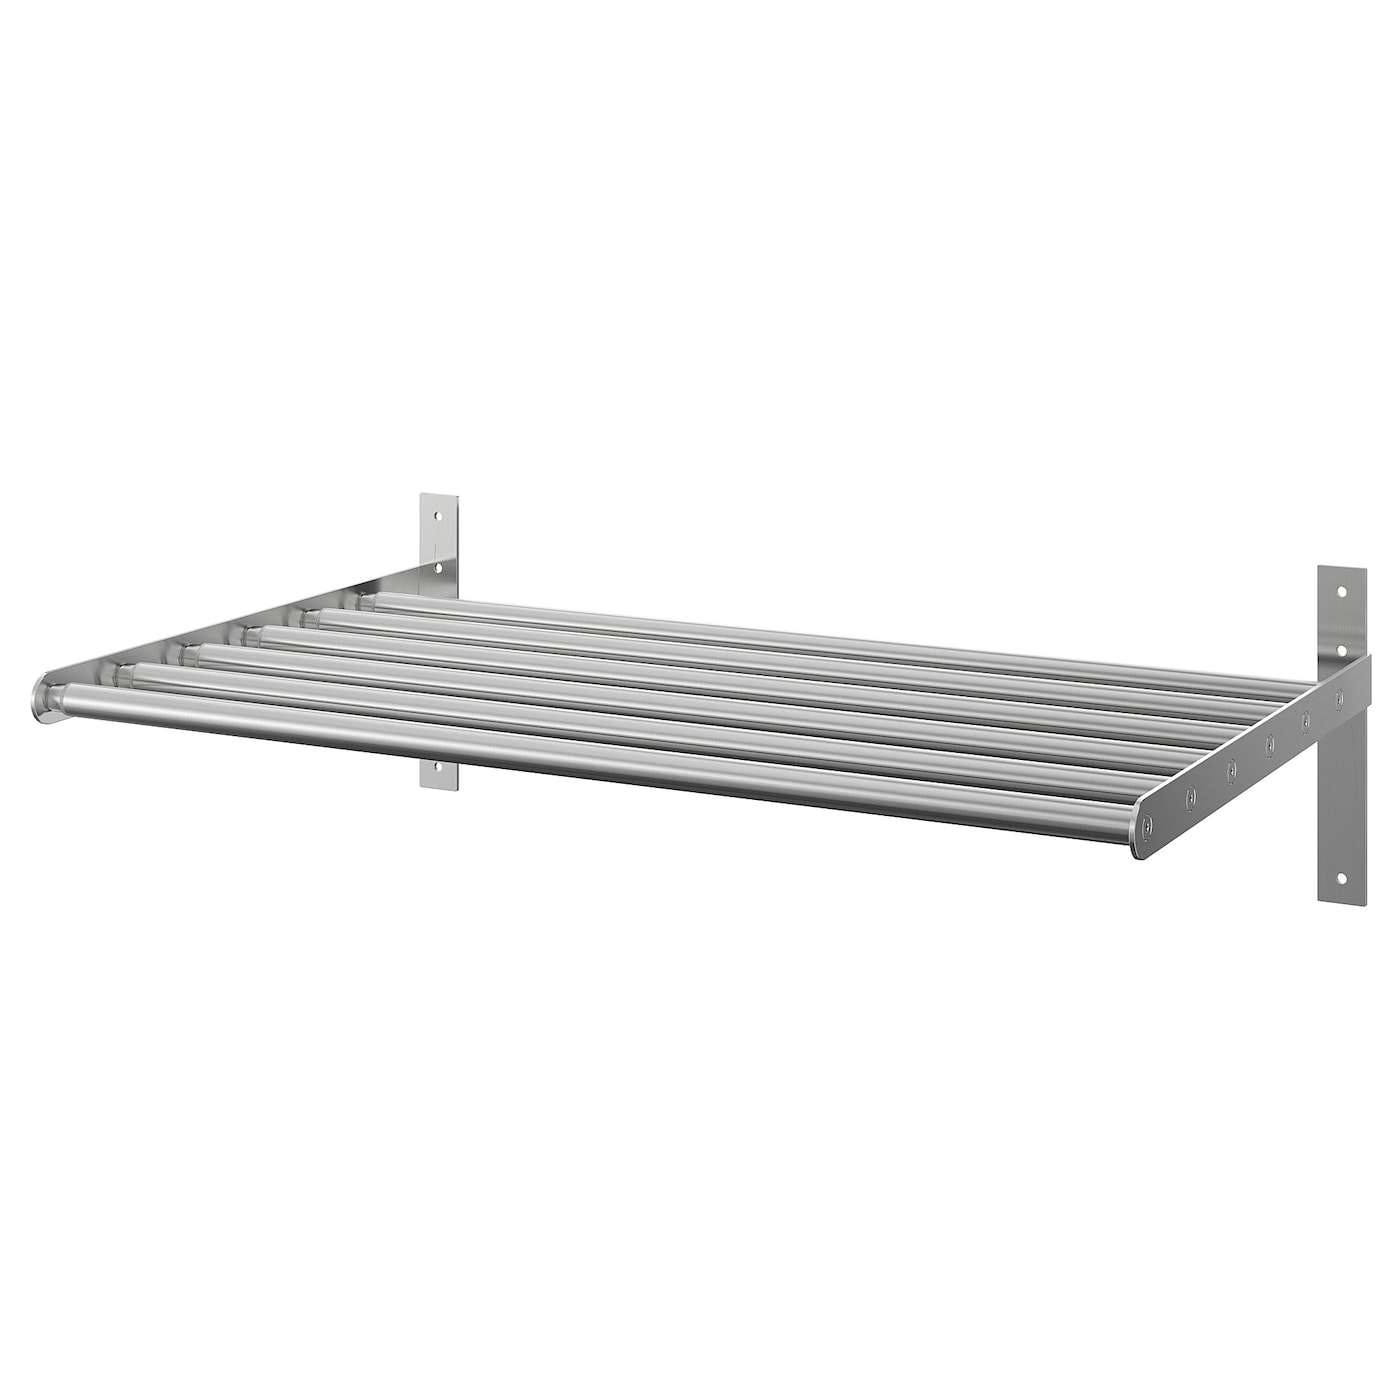 Ikea Grundtal – étagère murale en acier inoxydable: Amazon